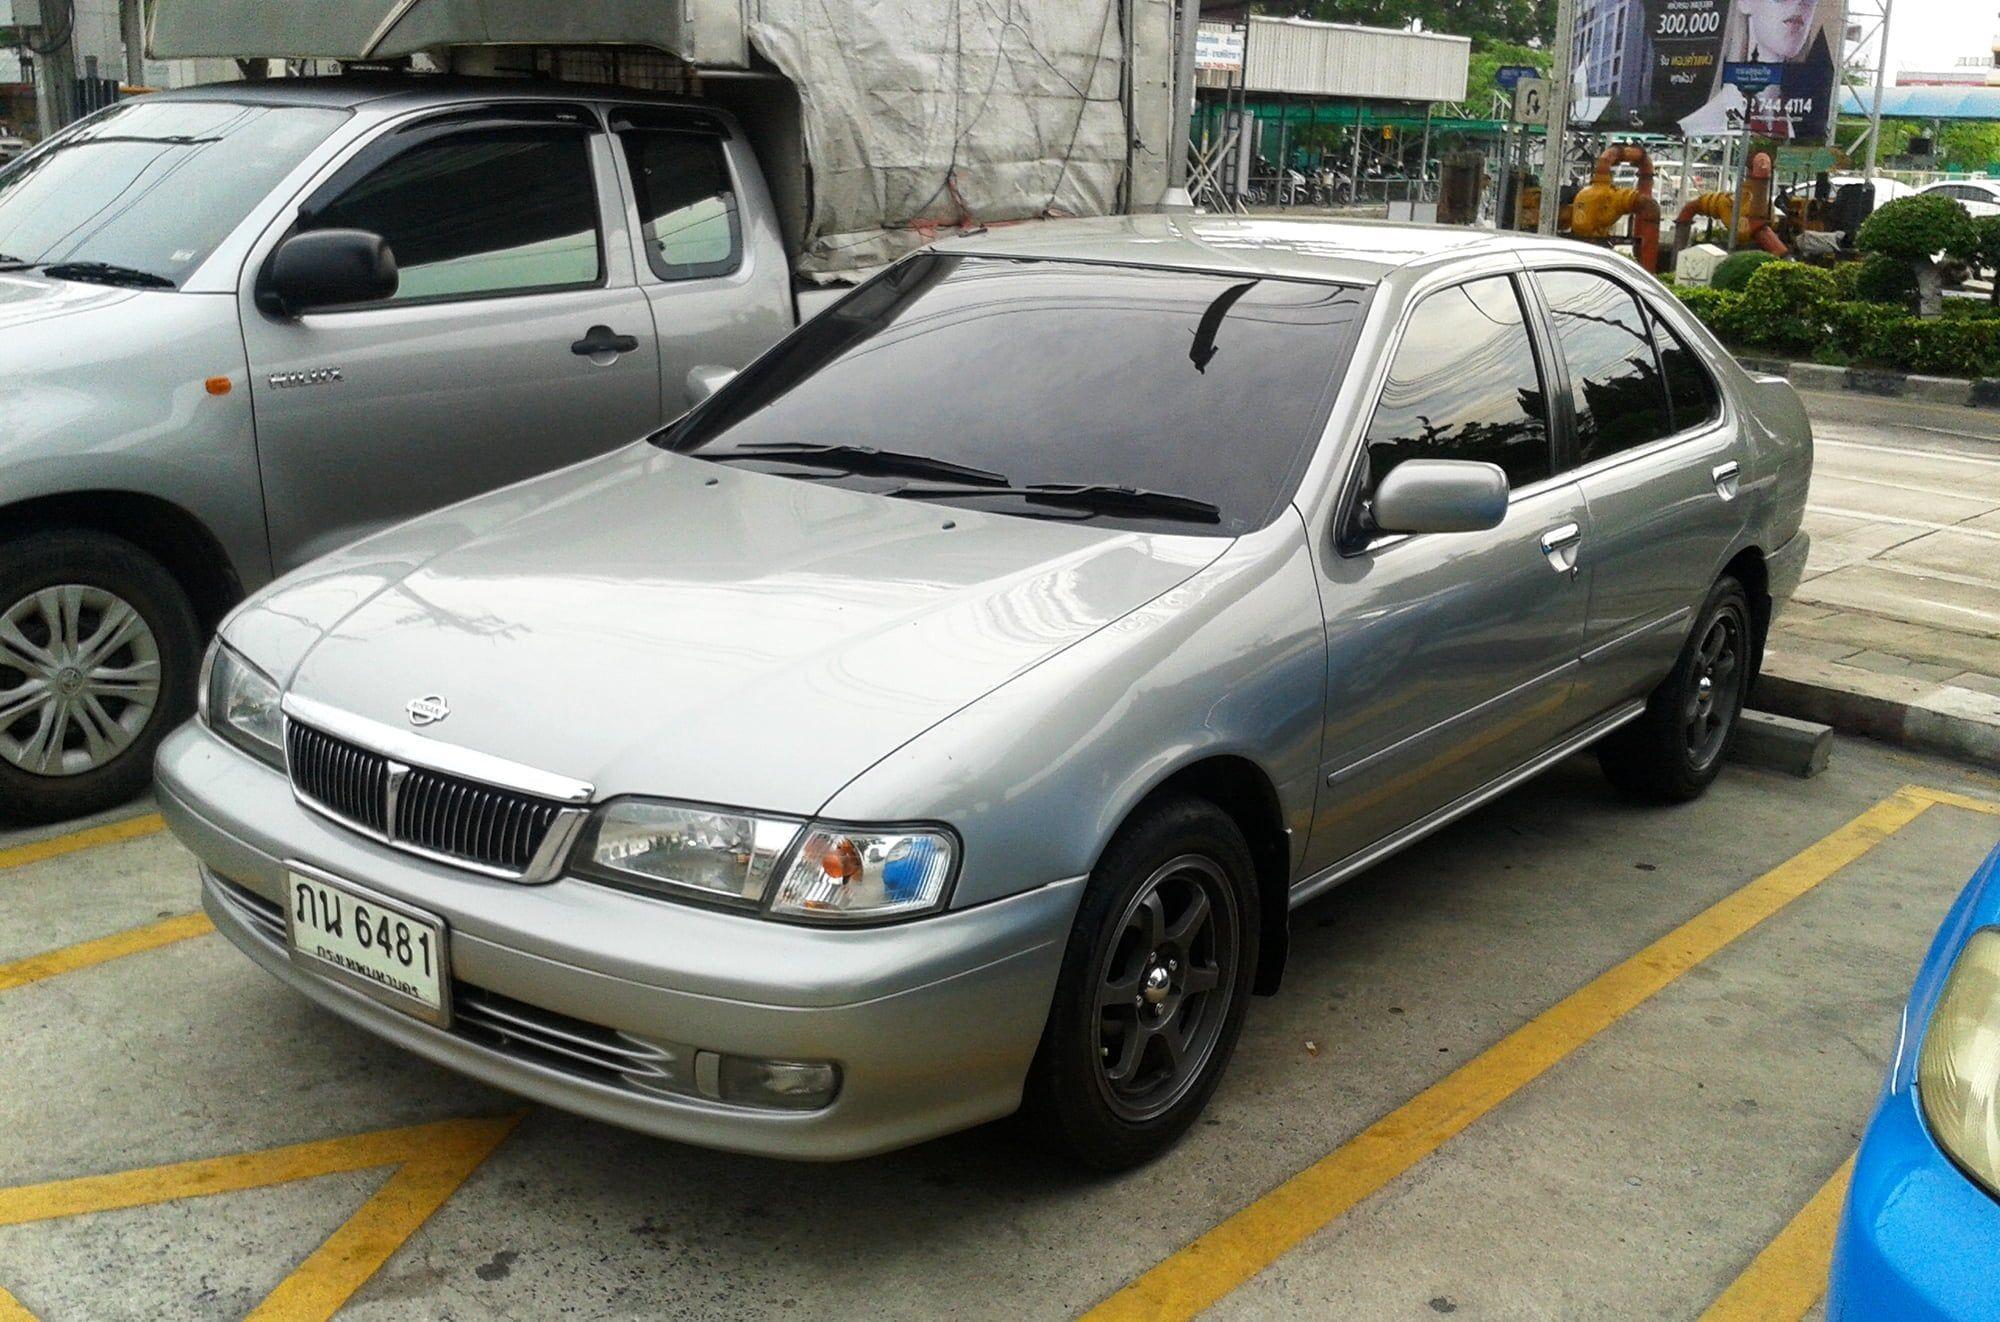 Modifikasi Mobil Nissan 97 Modifikasi Mobil Sedan Nissan